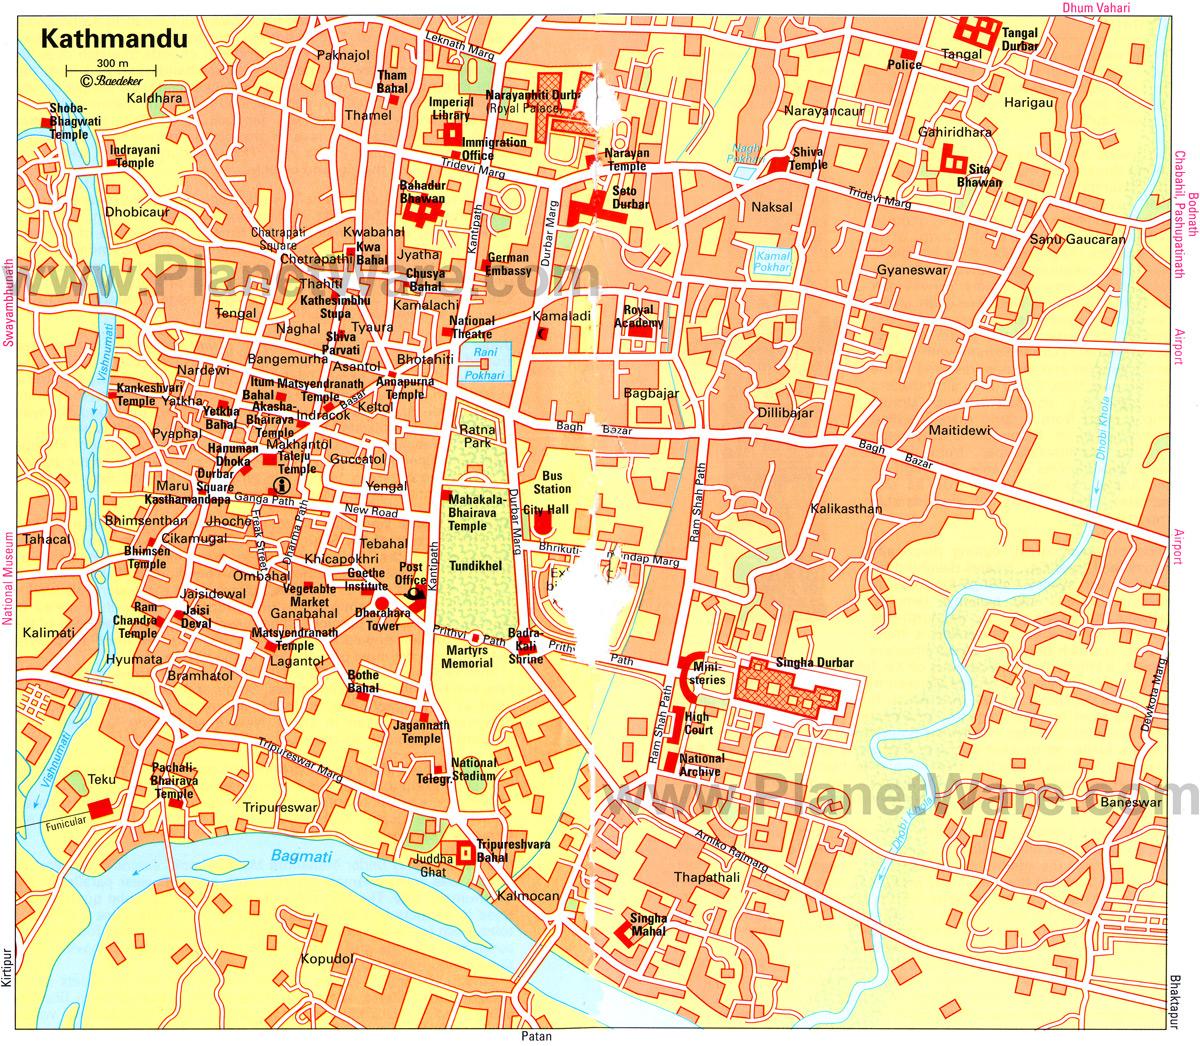 Mapa de Kathmandu, Nepal